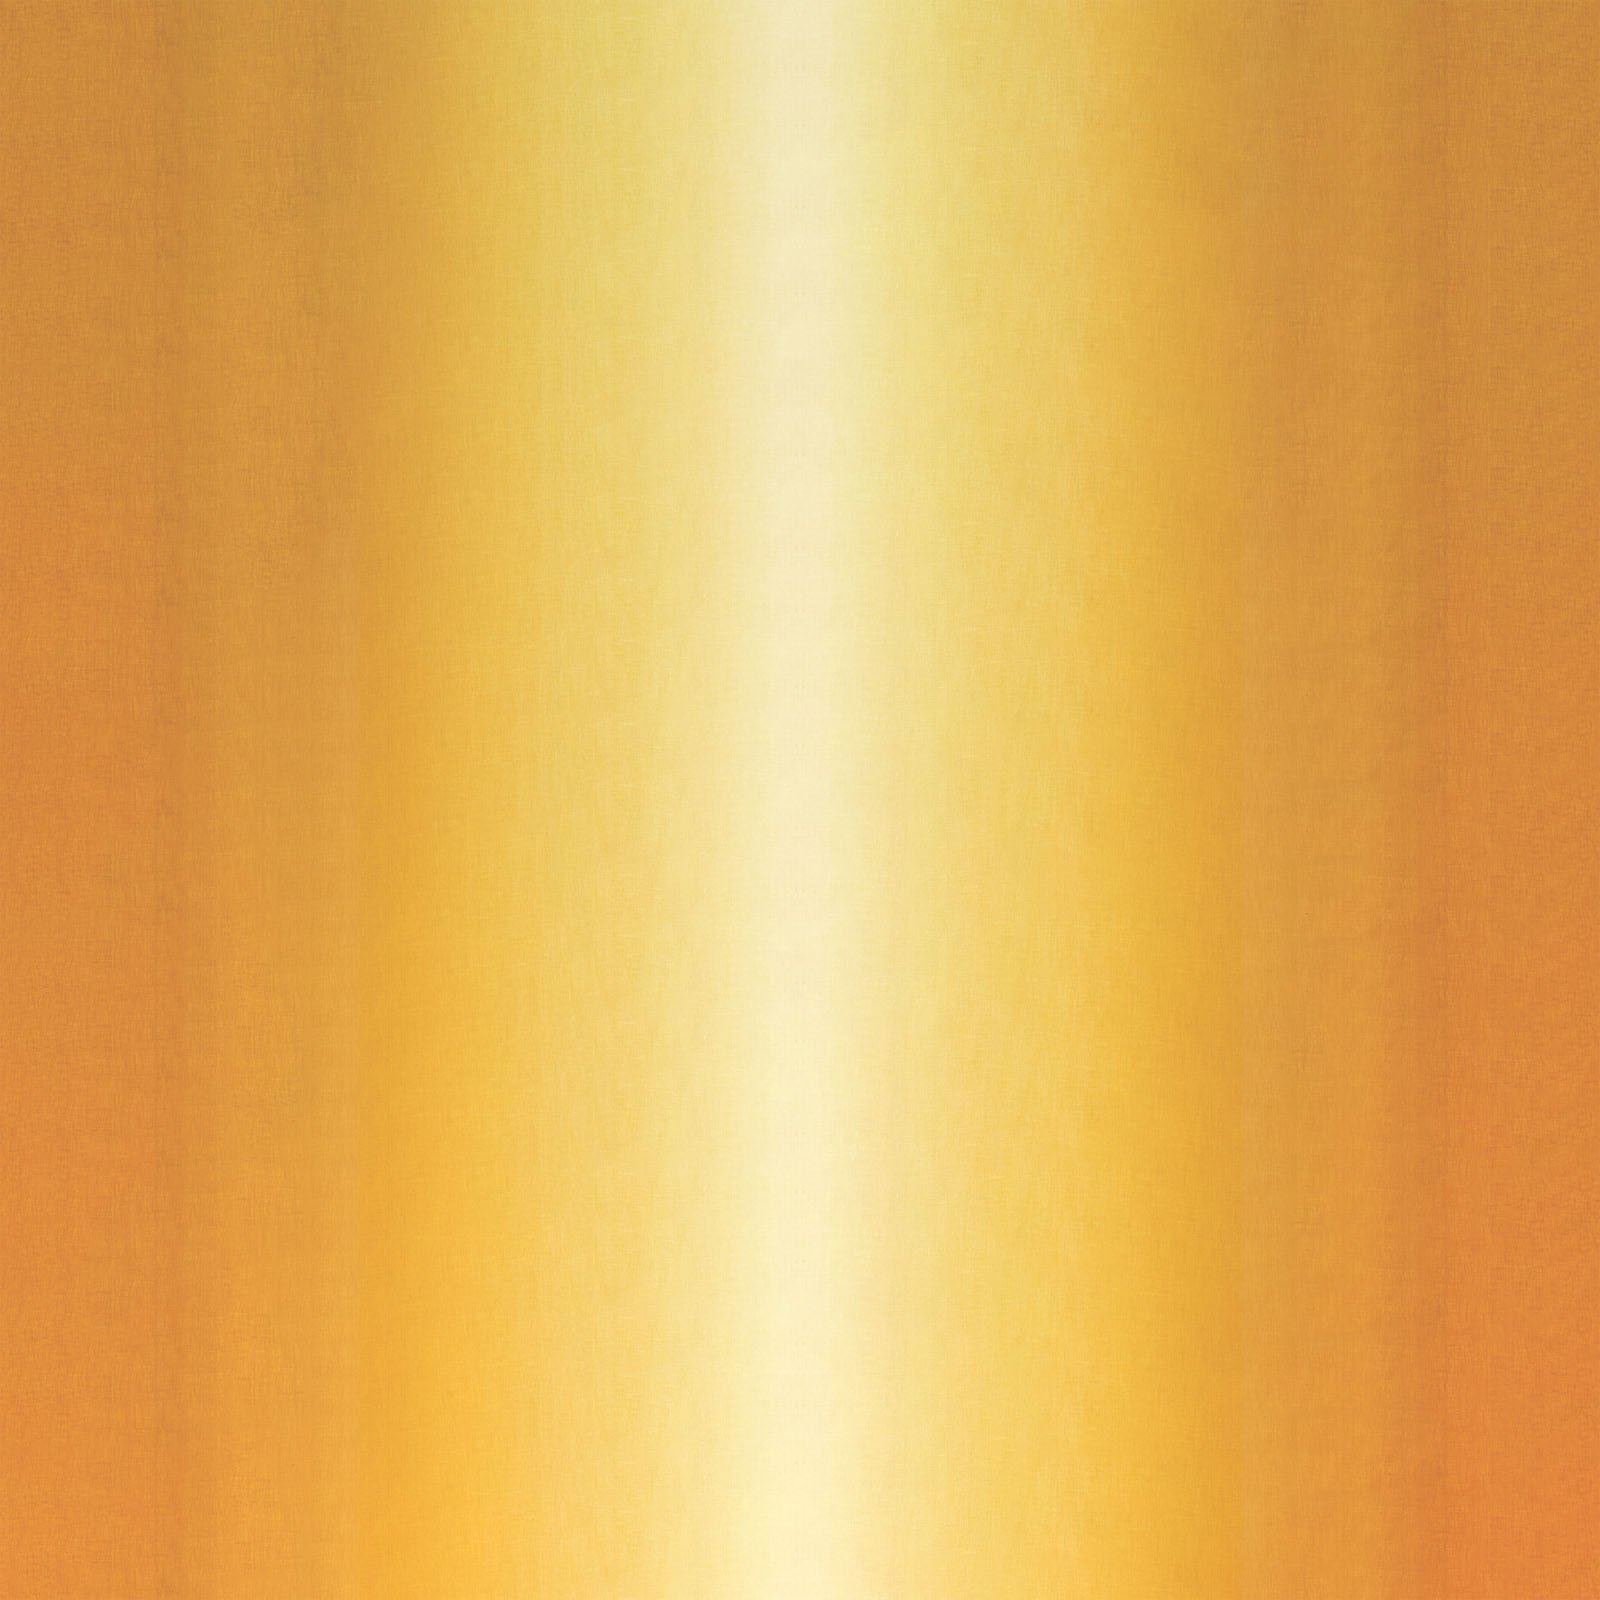 EESC-11216 S - GELATO OMBRE BY MAYWOOD YELLOW TONAL